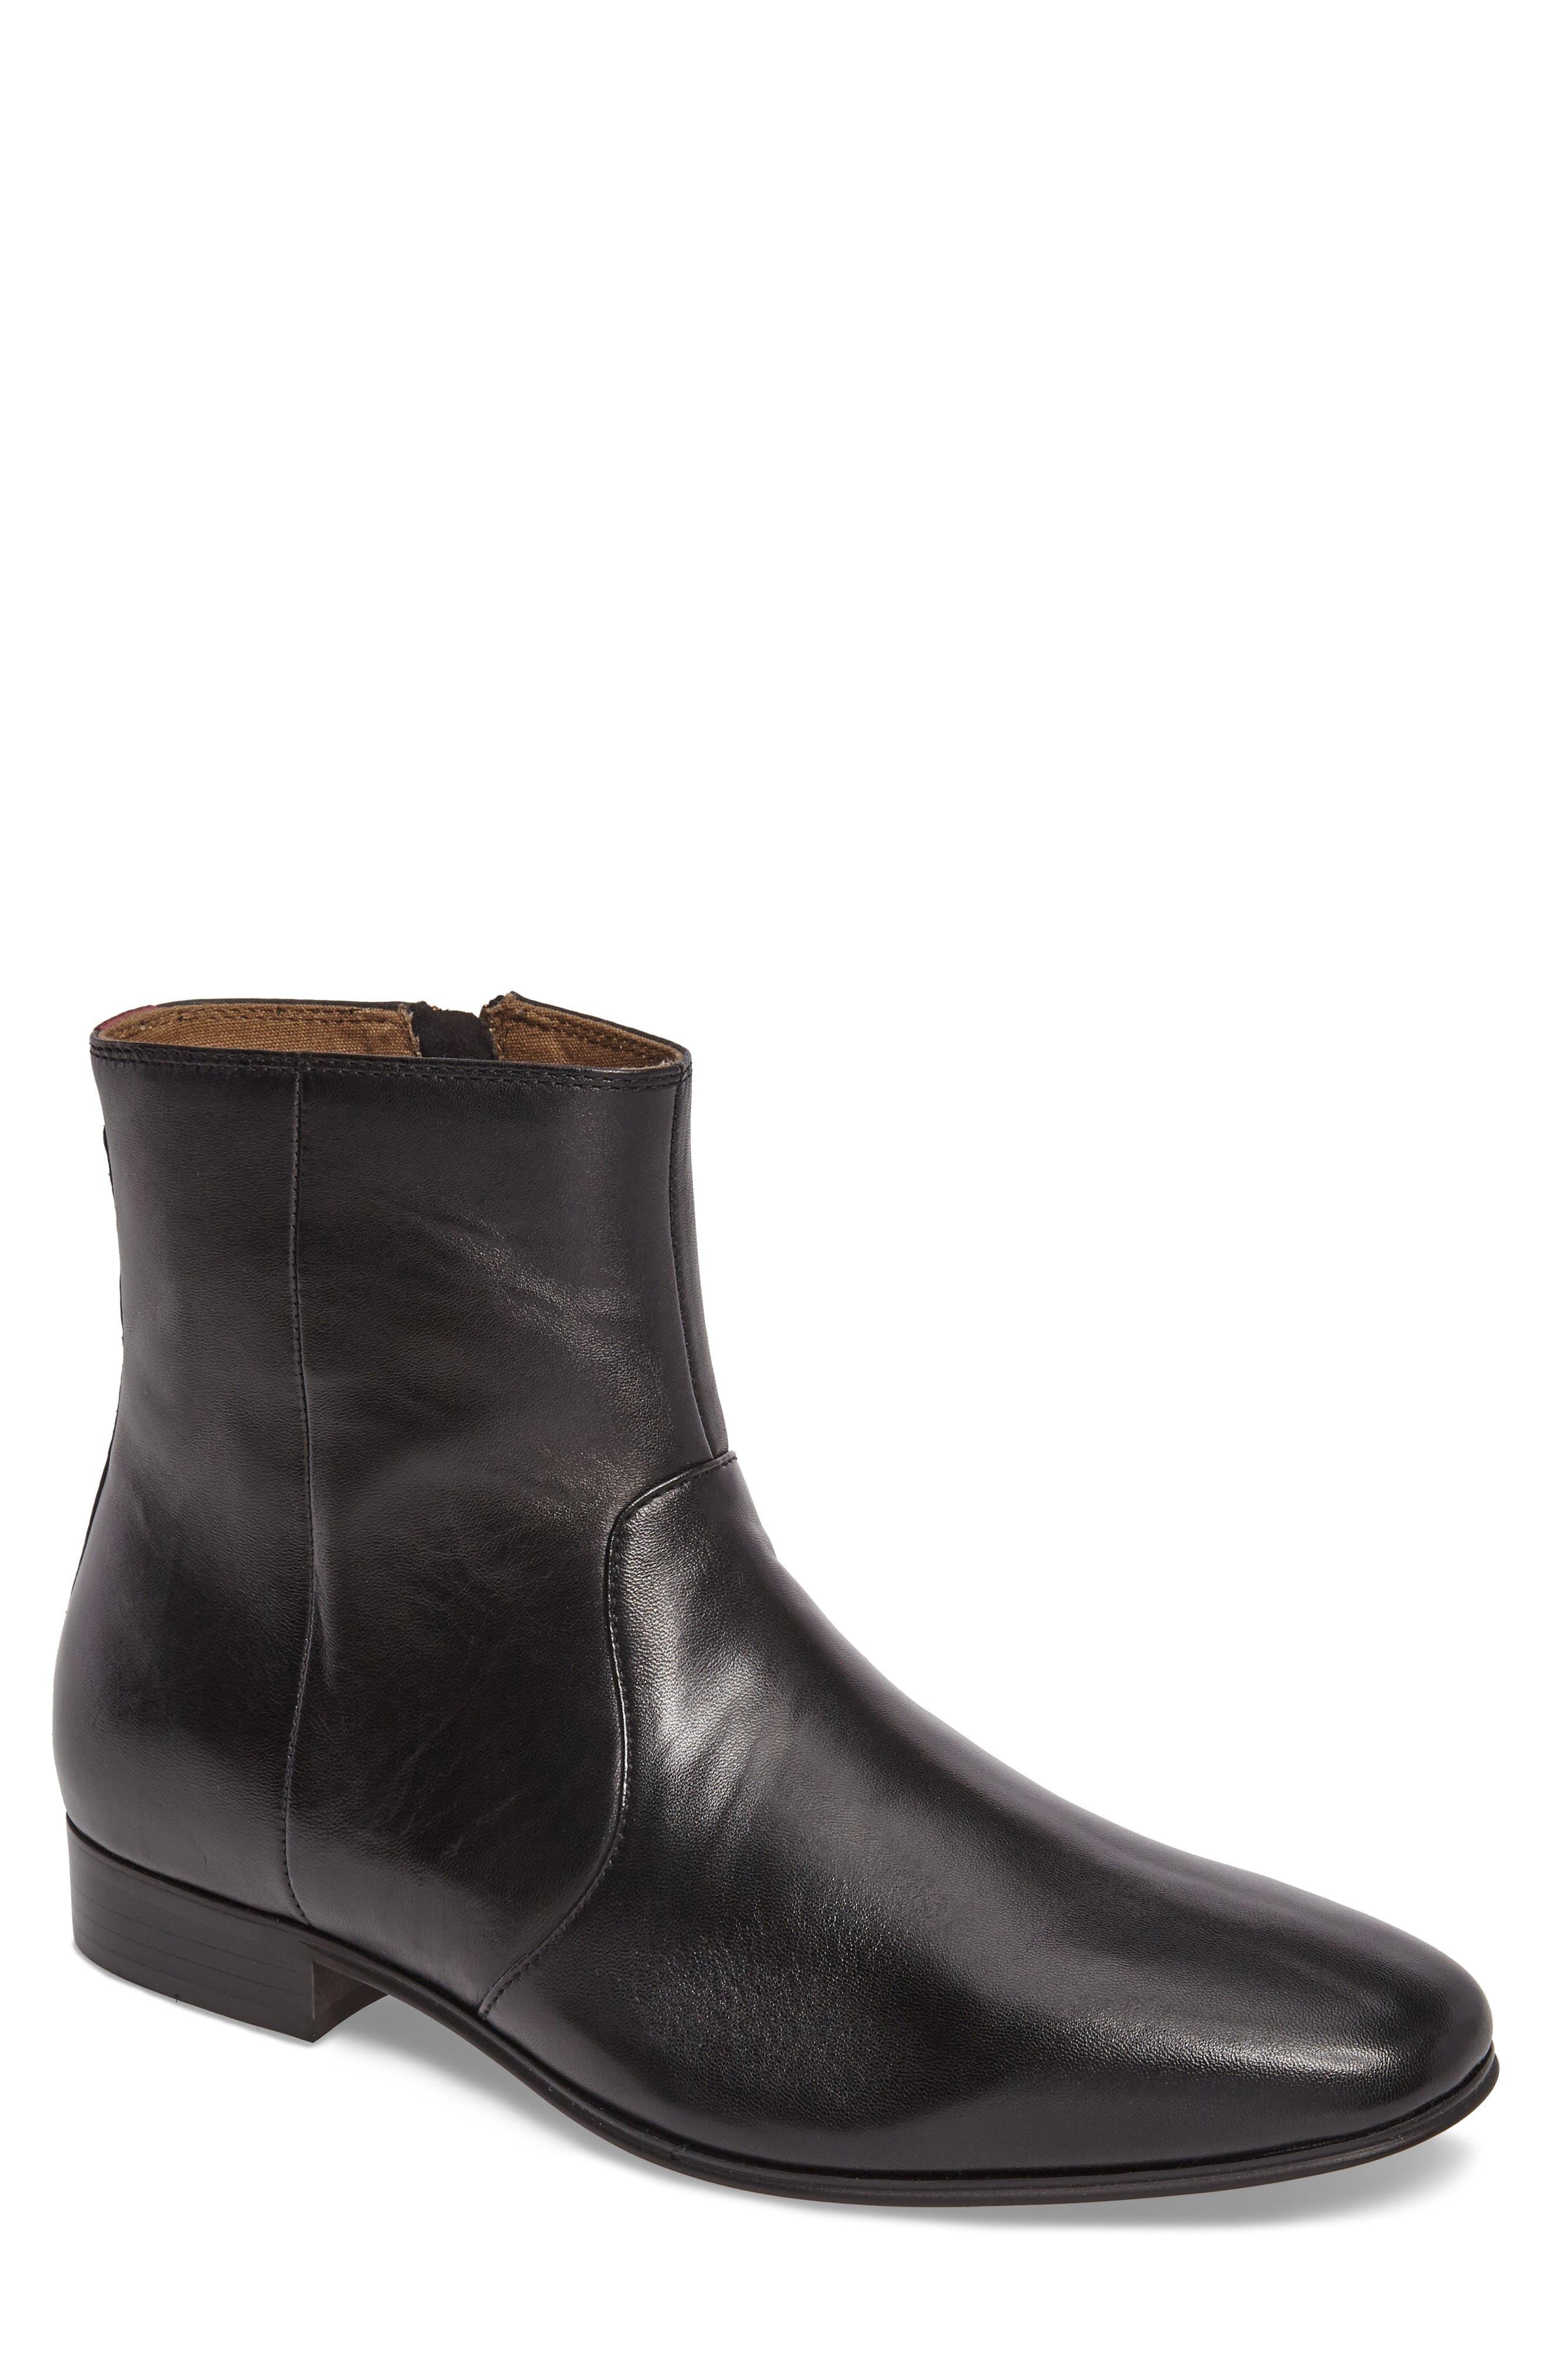 Arly Zip Boot,                         Main,                         color, 002